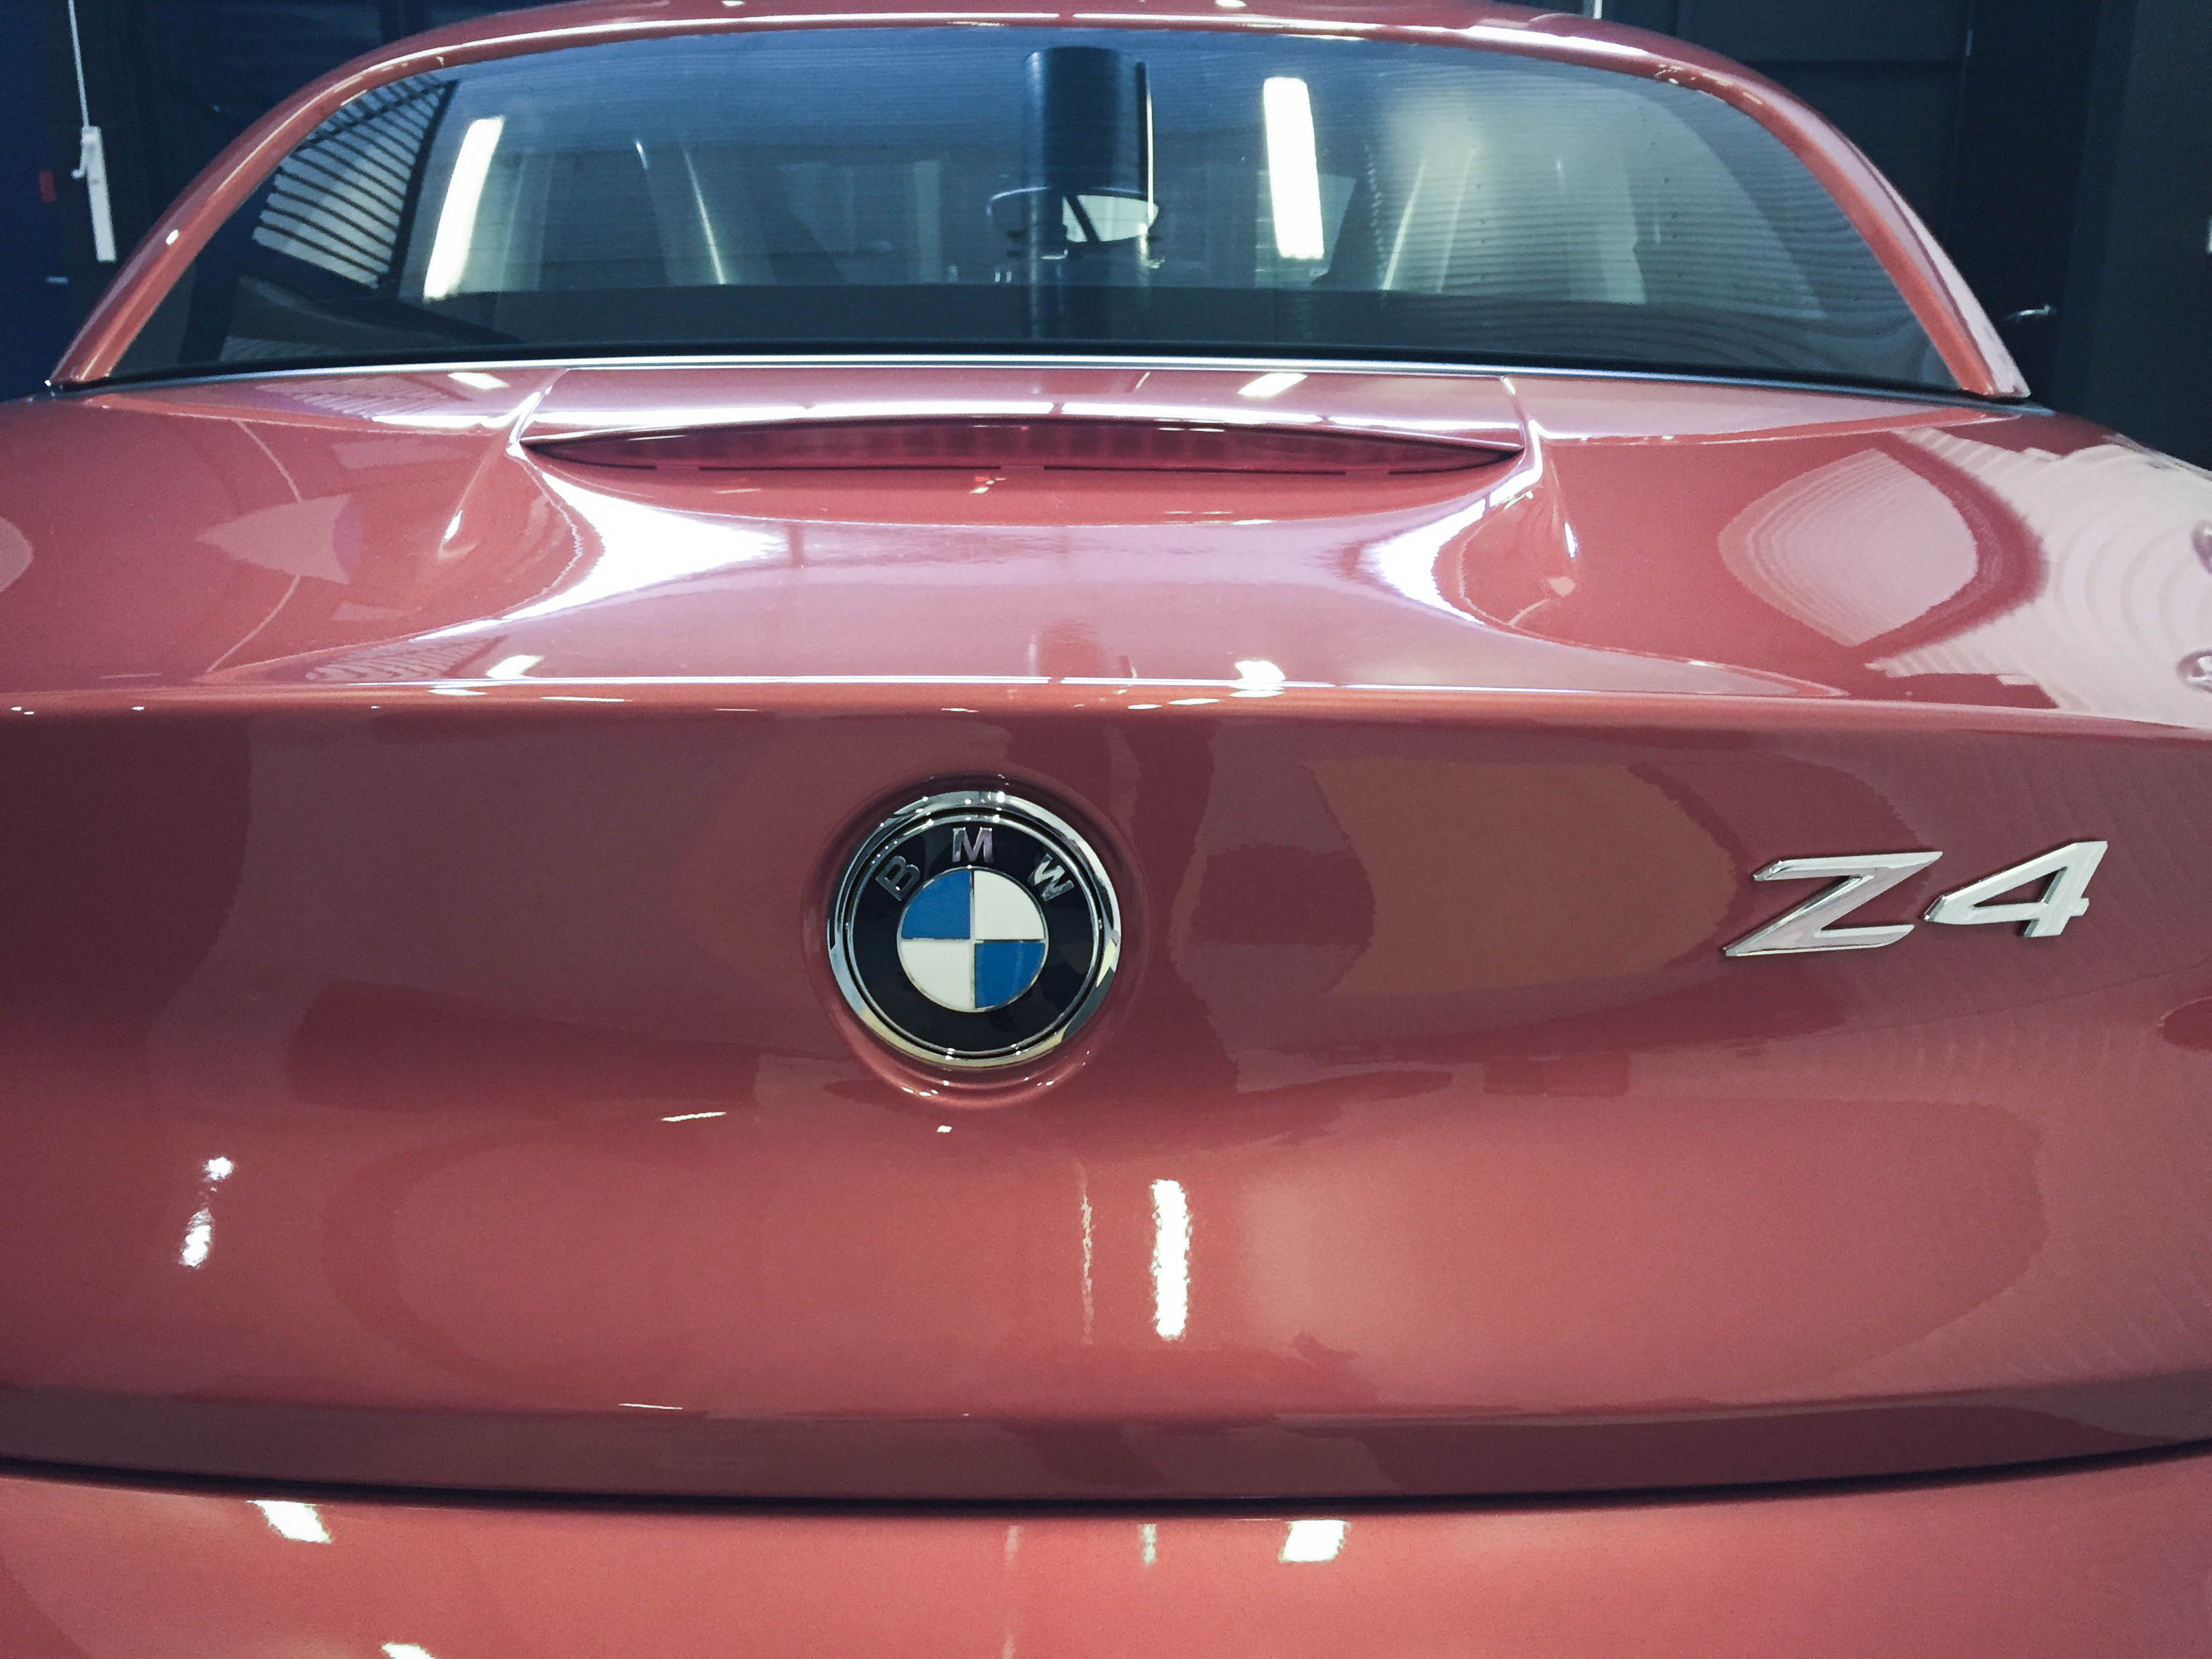 BMW Z4 –Badge